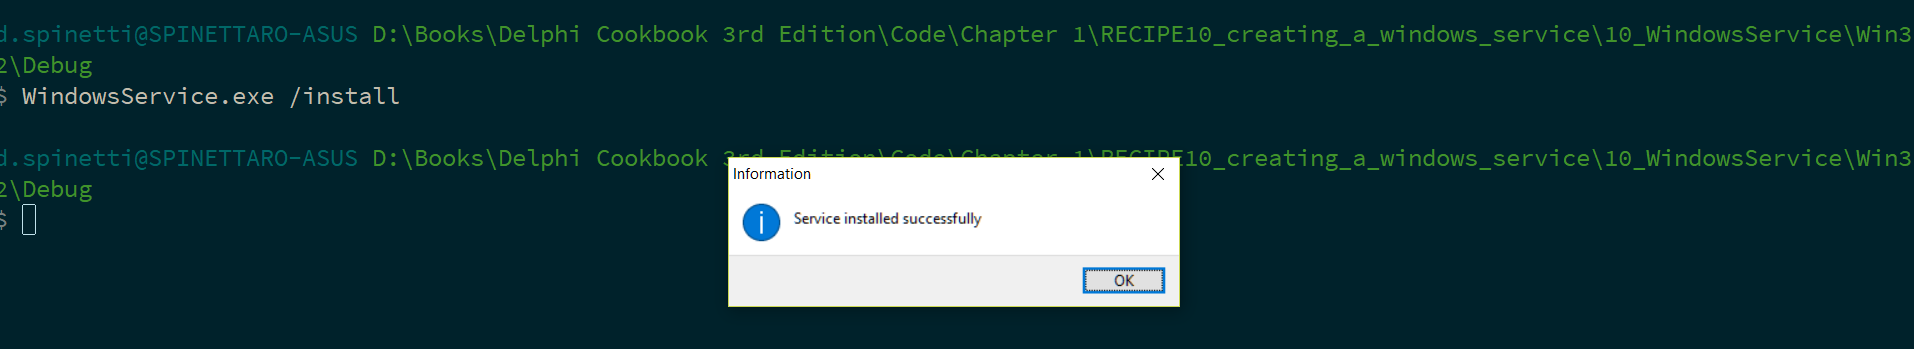 Creating a Windows Service - Delphi Cookbook - Third Edition